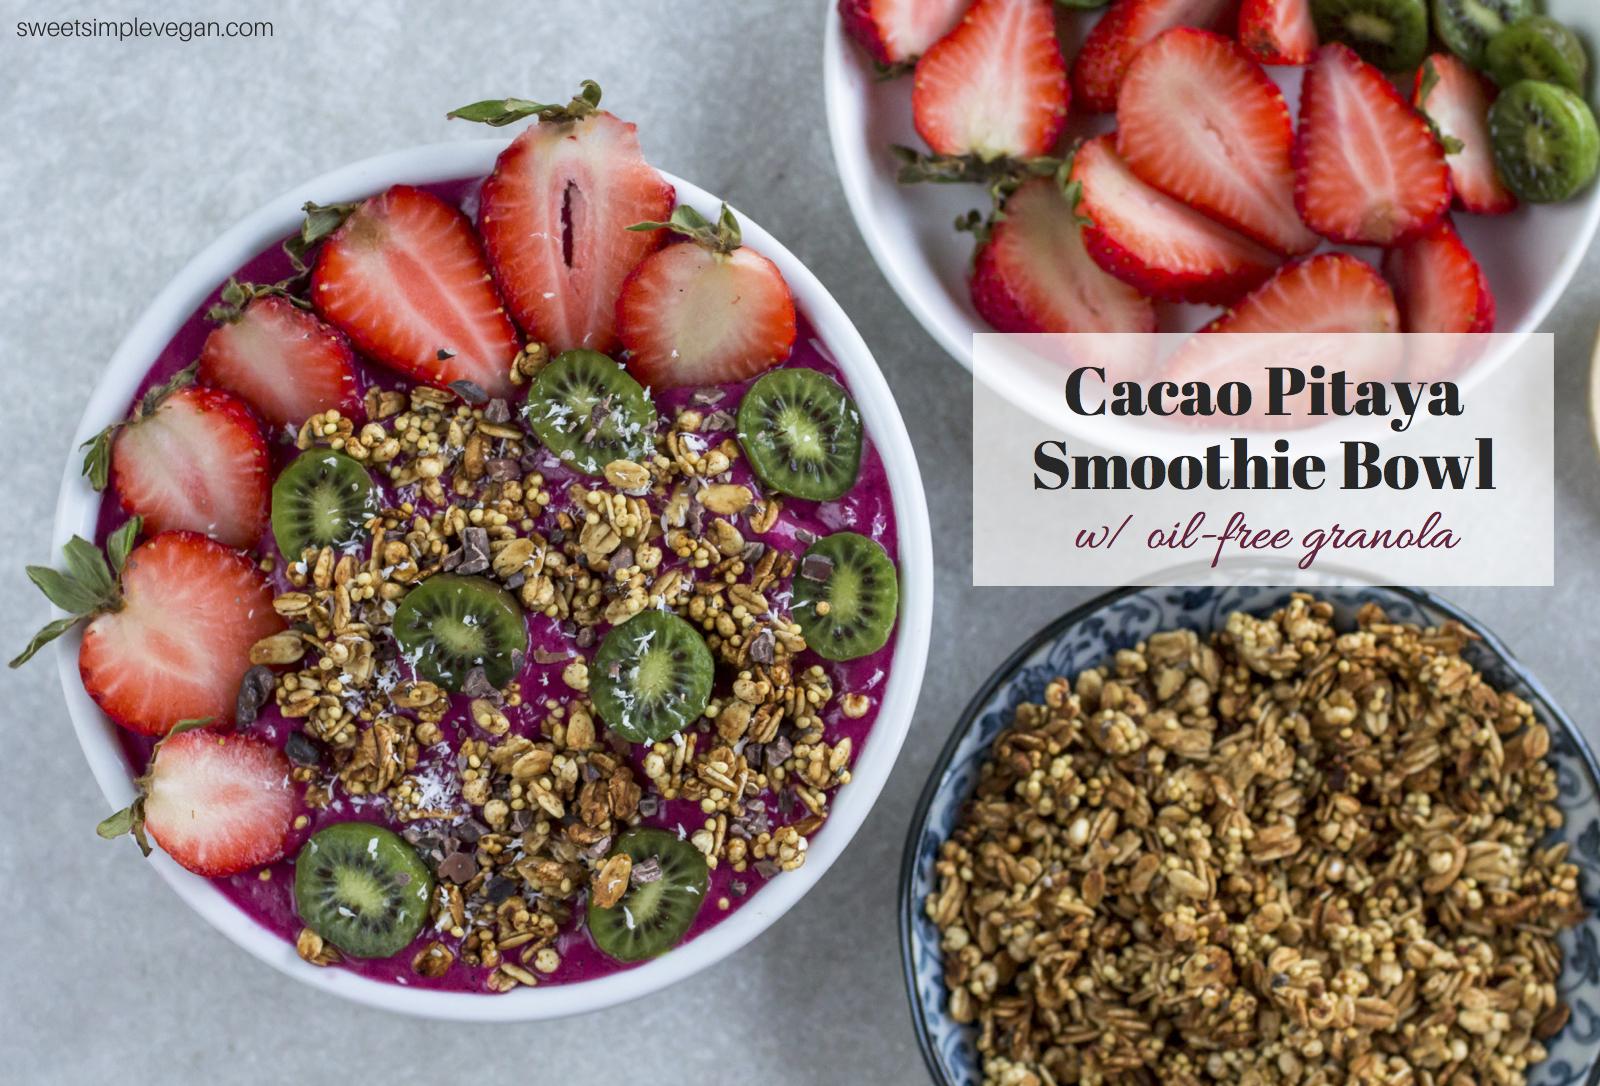 Cacao Pitaya Protein Smoothie Bowl w/ Oil-Free Granola | sweetsimplevegan.com